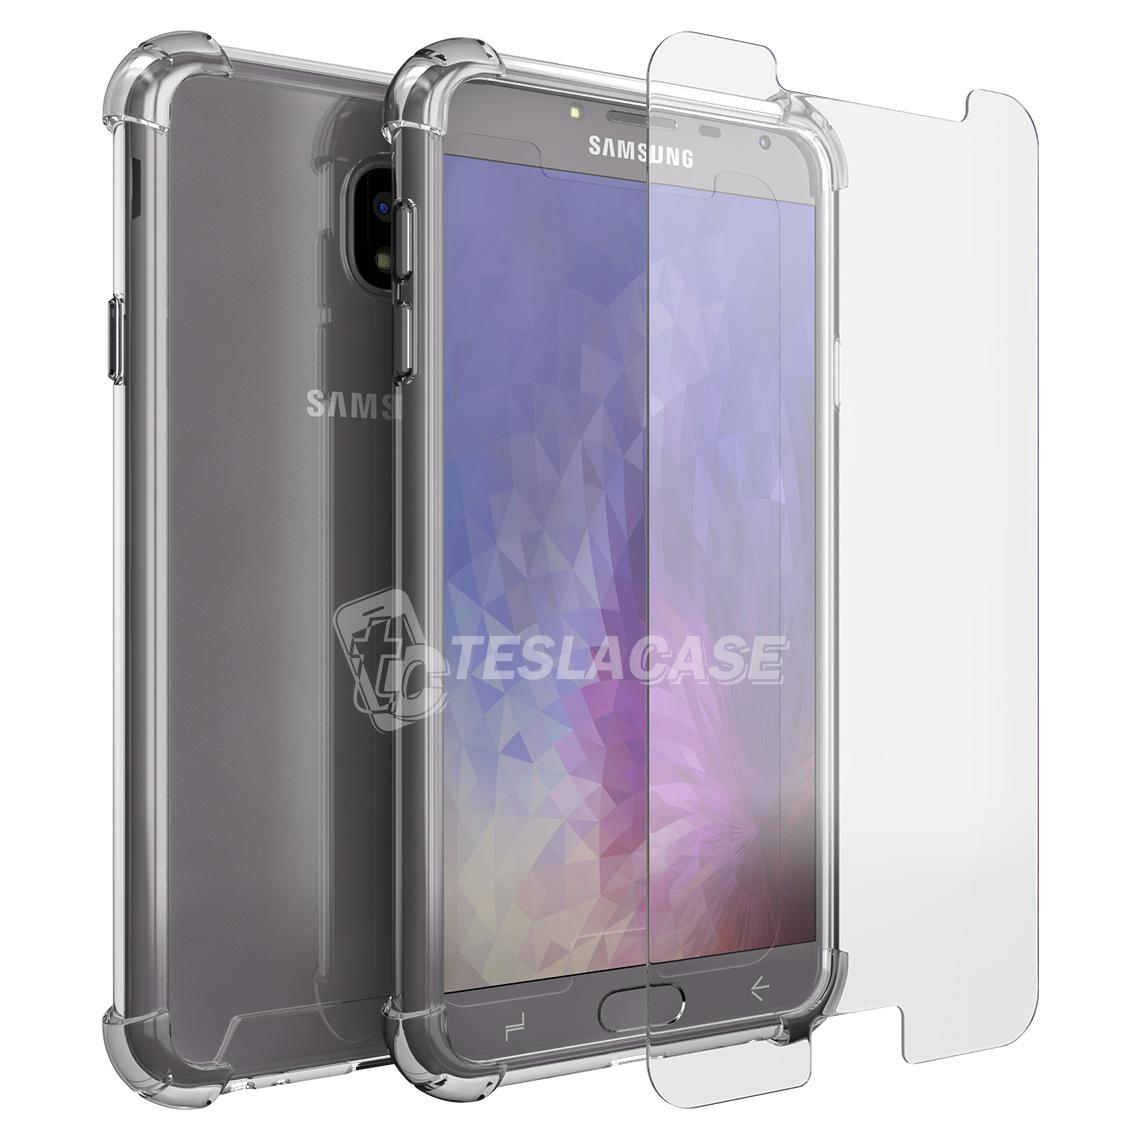 Para Samsung Galaxy J4 2018 J400F J400FD Lente de Cristal Frontal Cubierta Exterior LCD PANTALLA